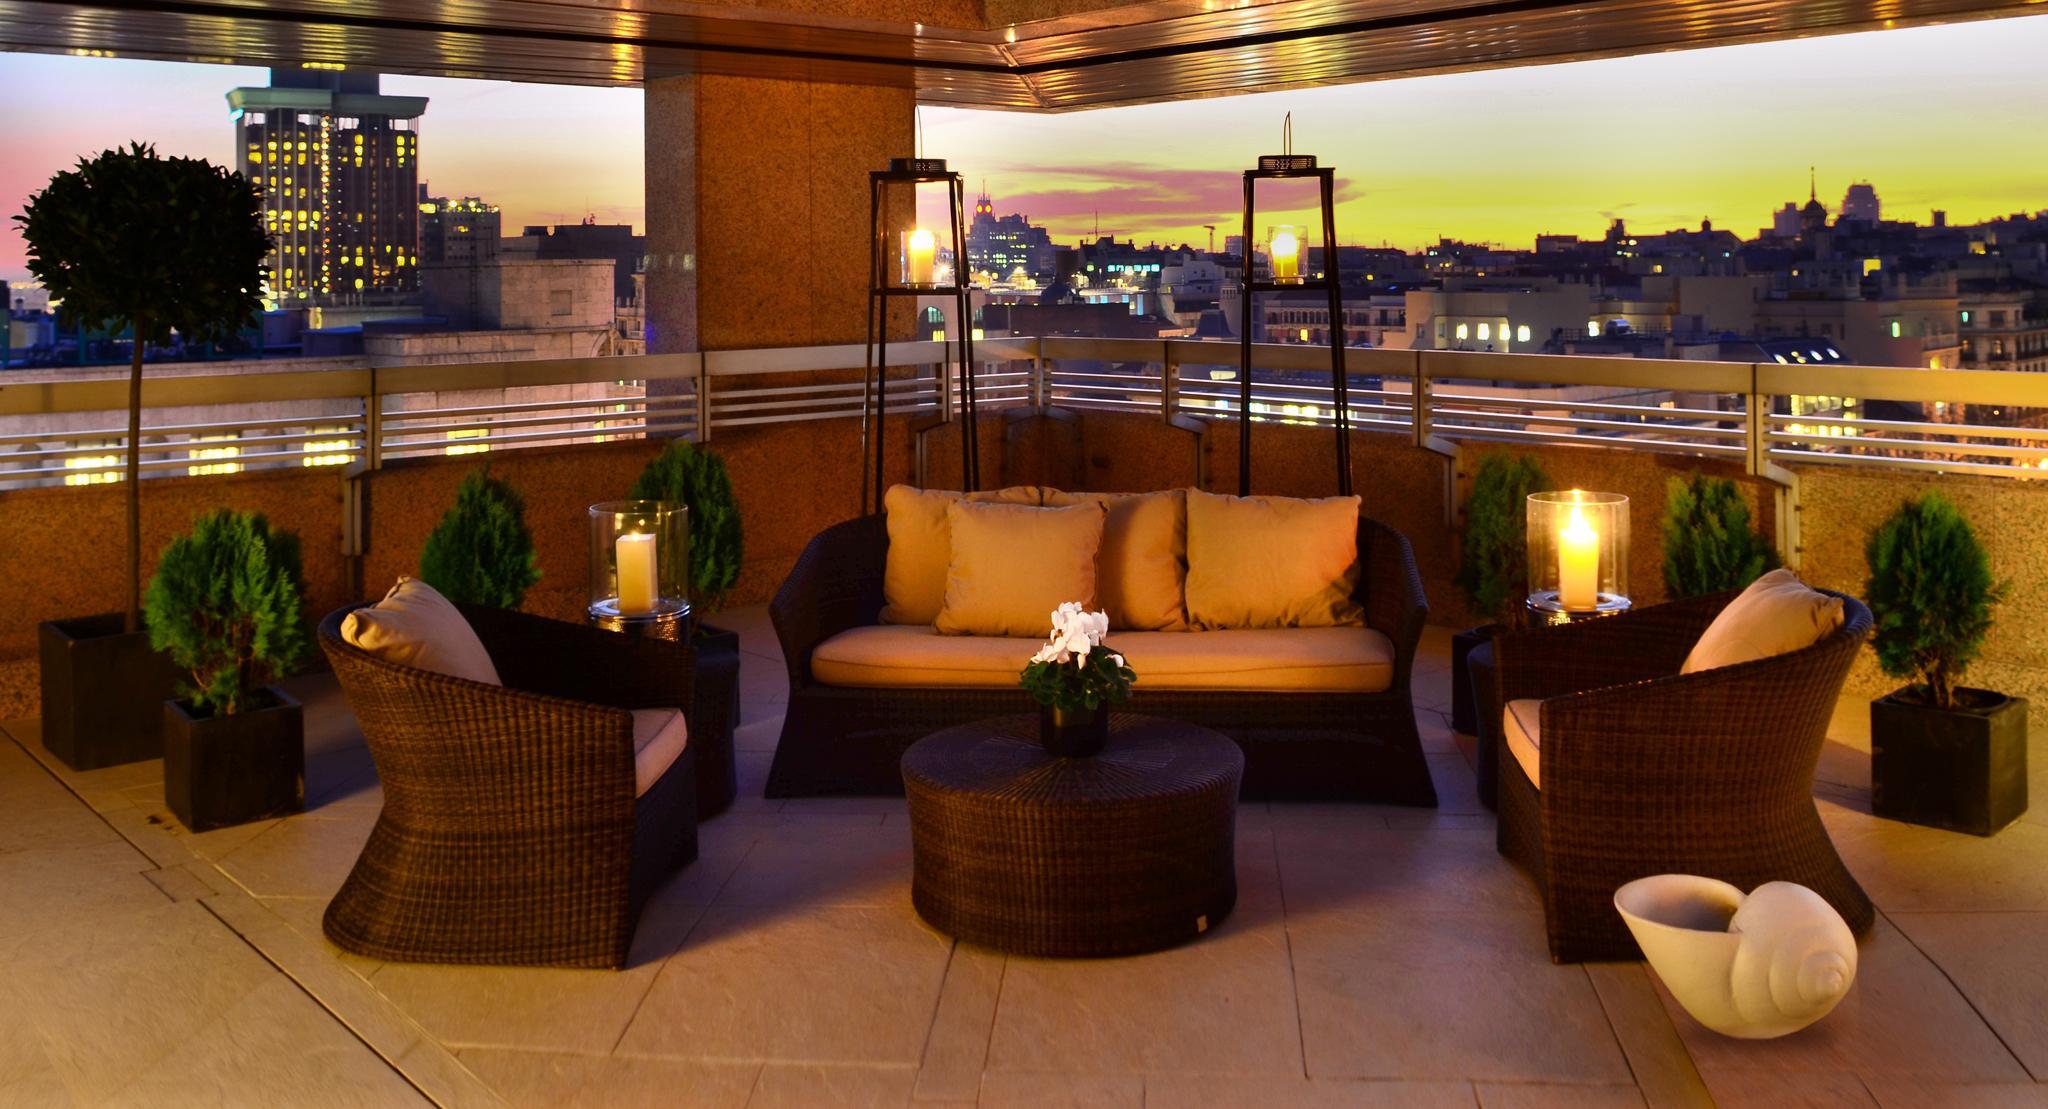 Suite Real Terrace Hotel Villa Magna, Madrid